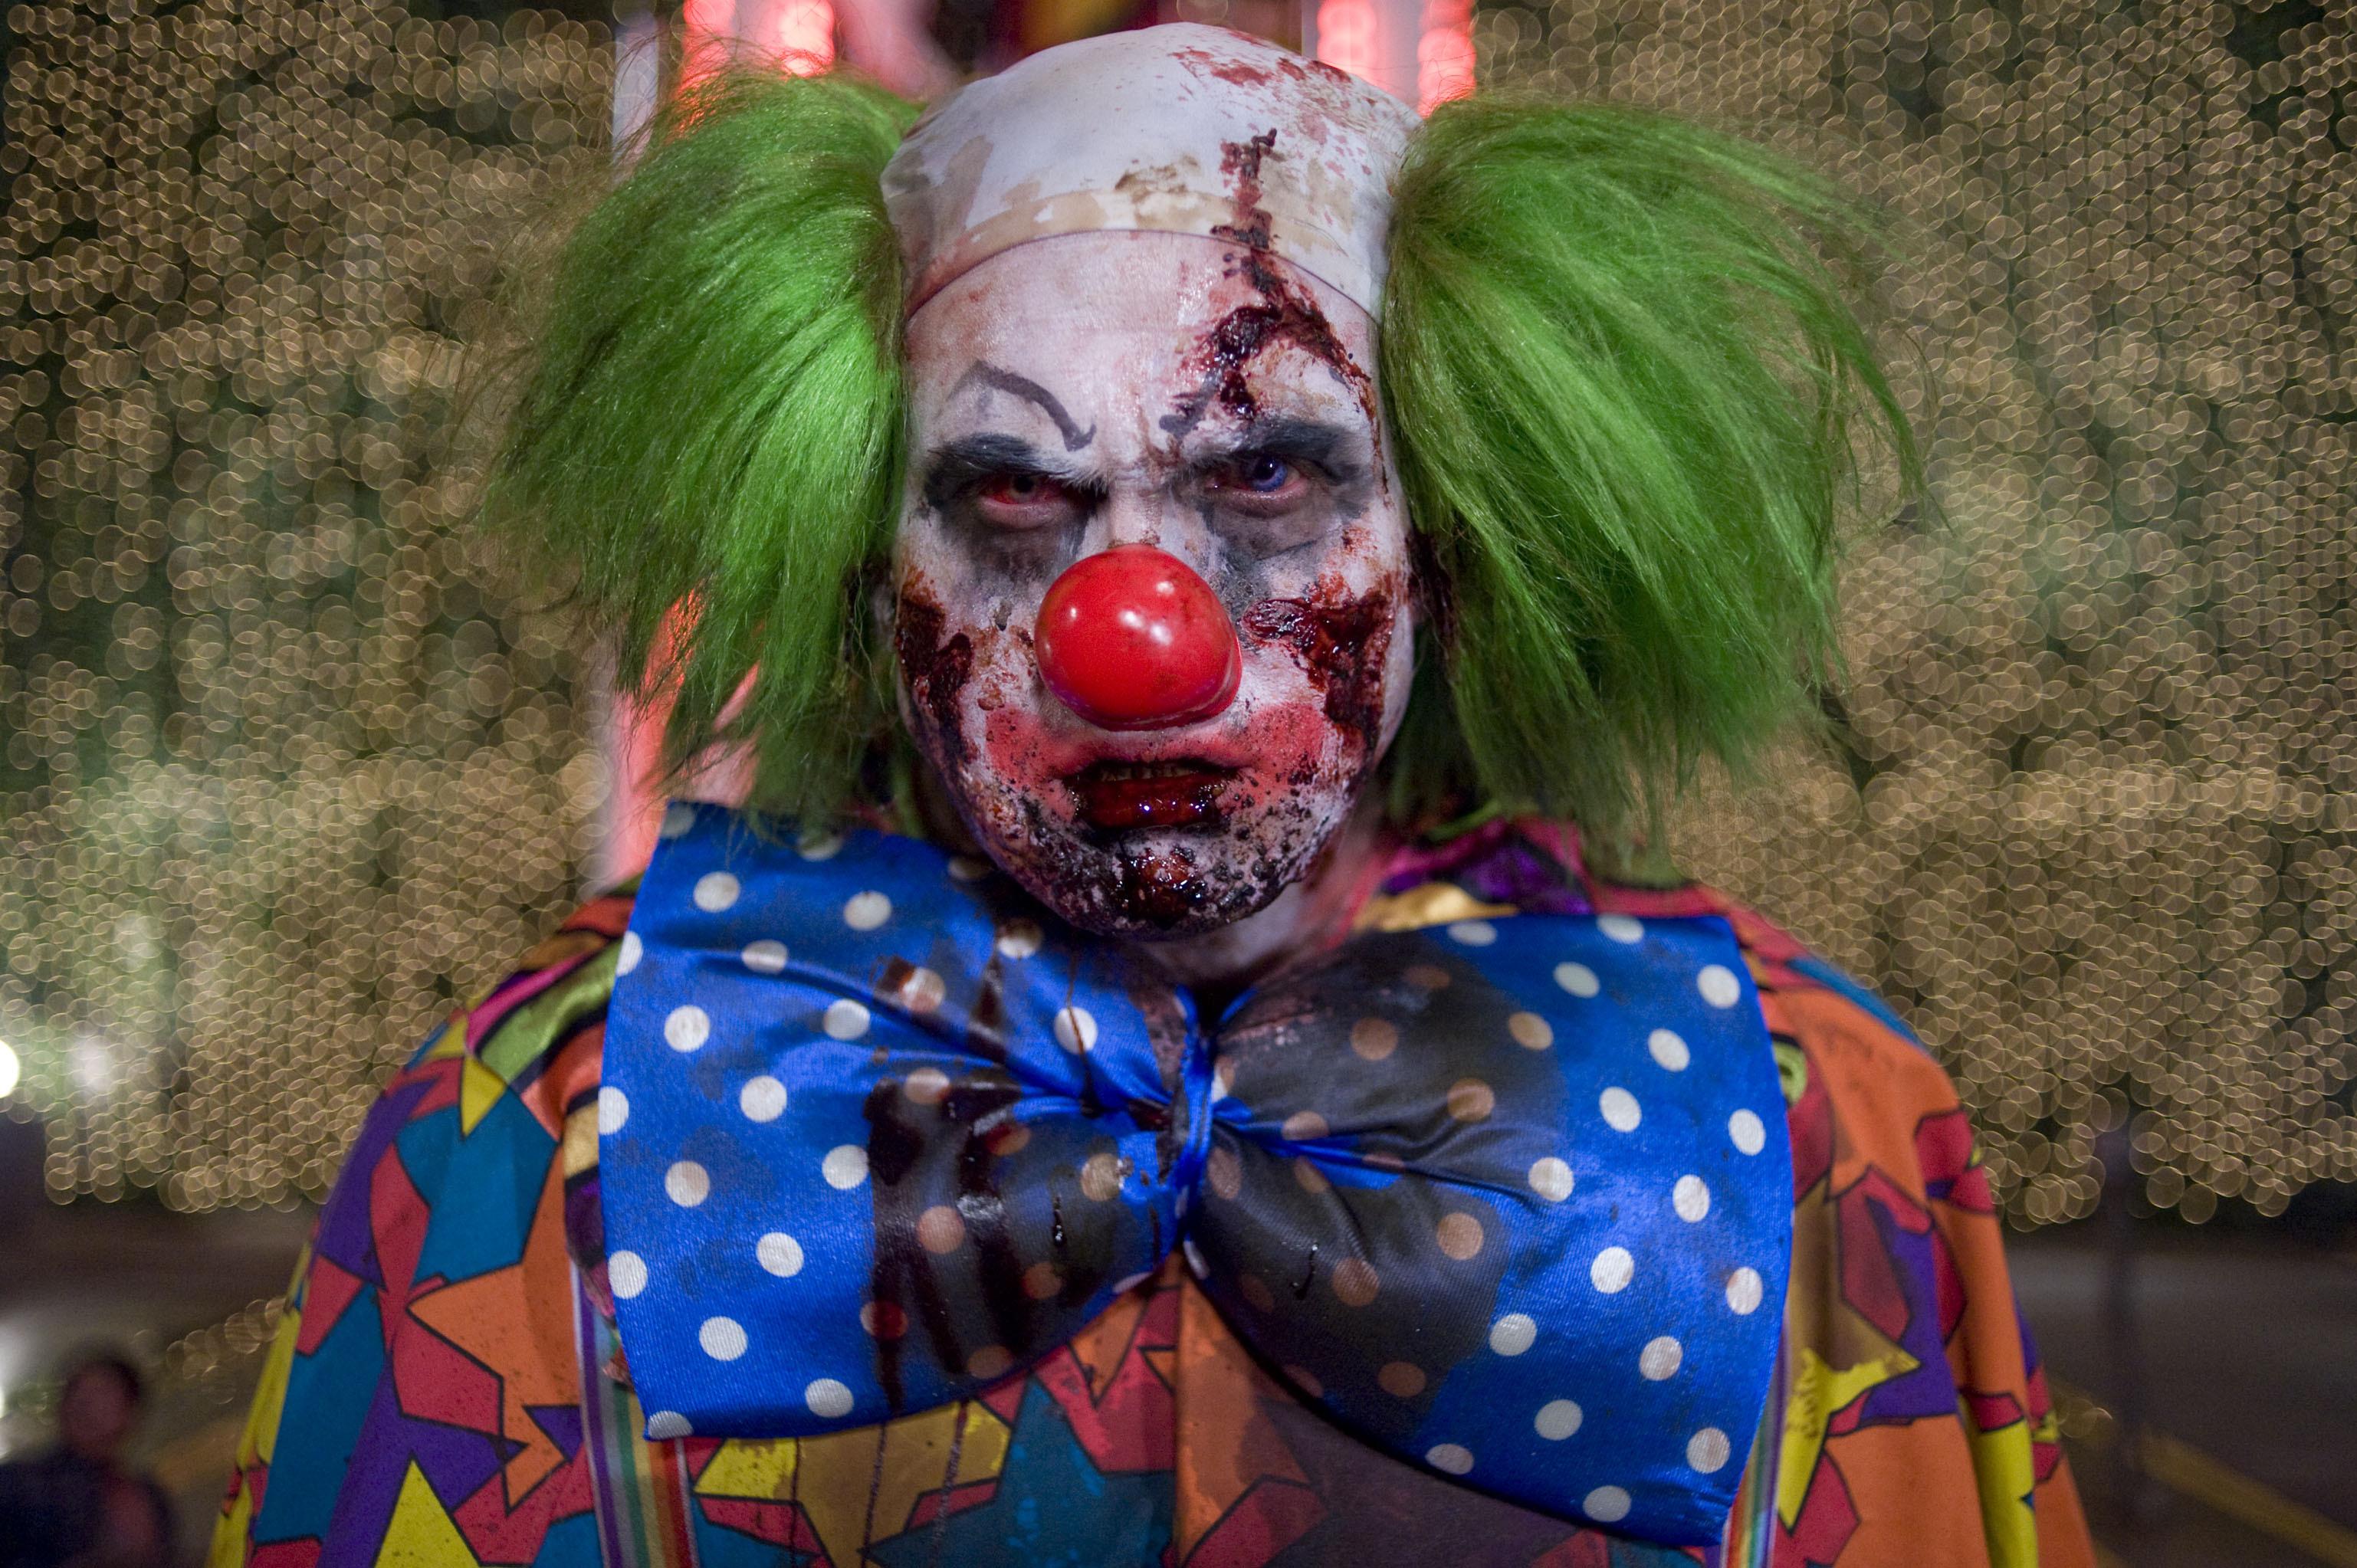 ВШвеции «клоун-убийца» напал сножом на мужчины